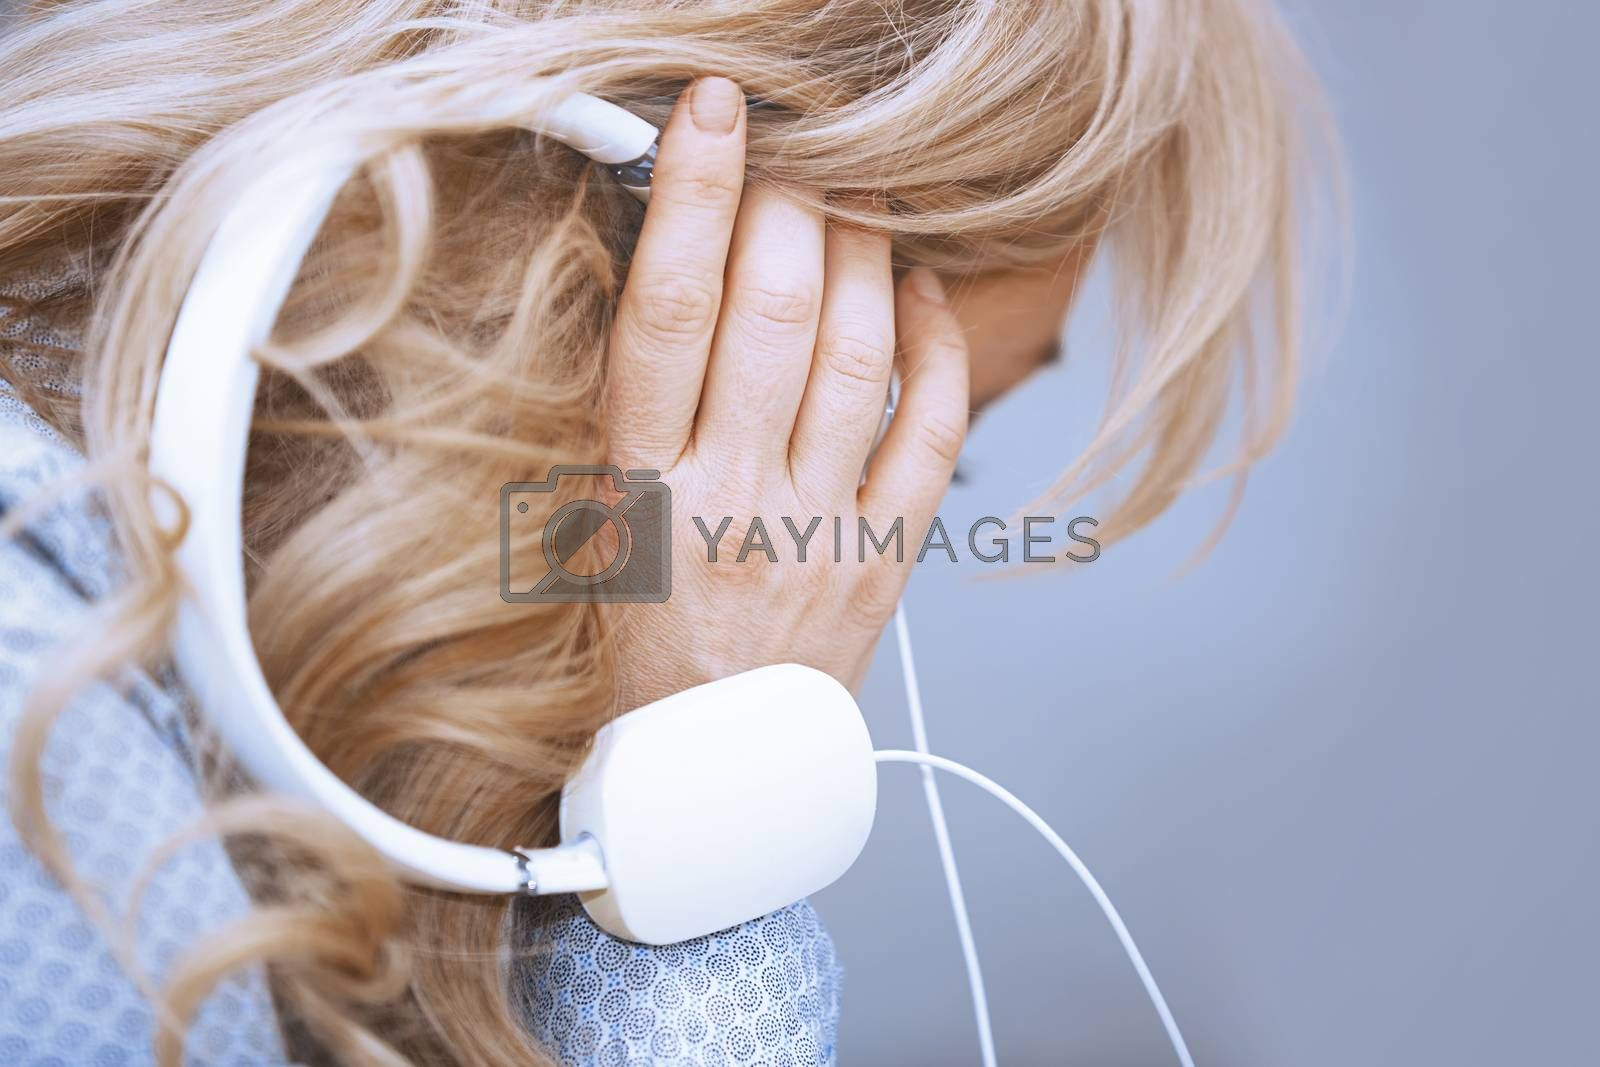 Royalty free image of Blond woman listening music via headphones by Novic